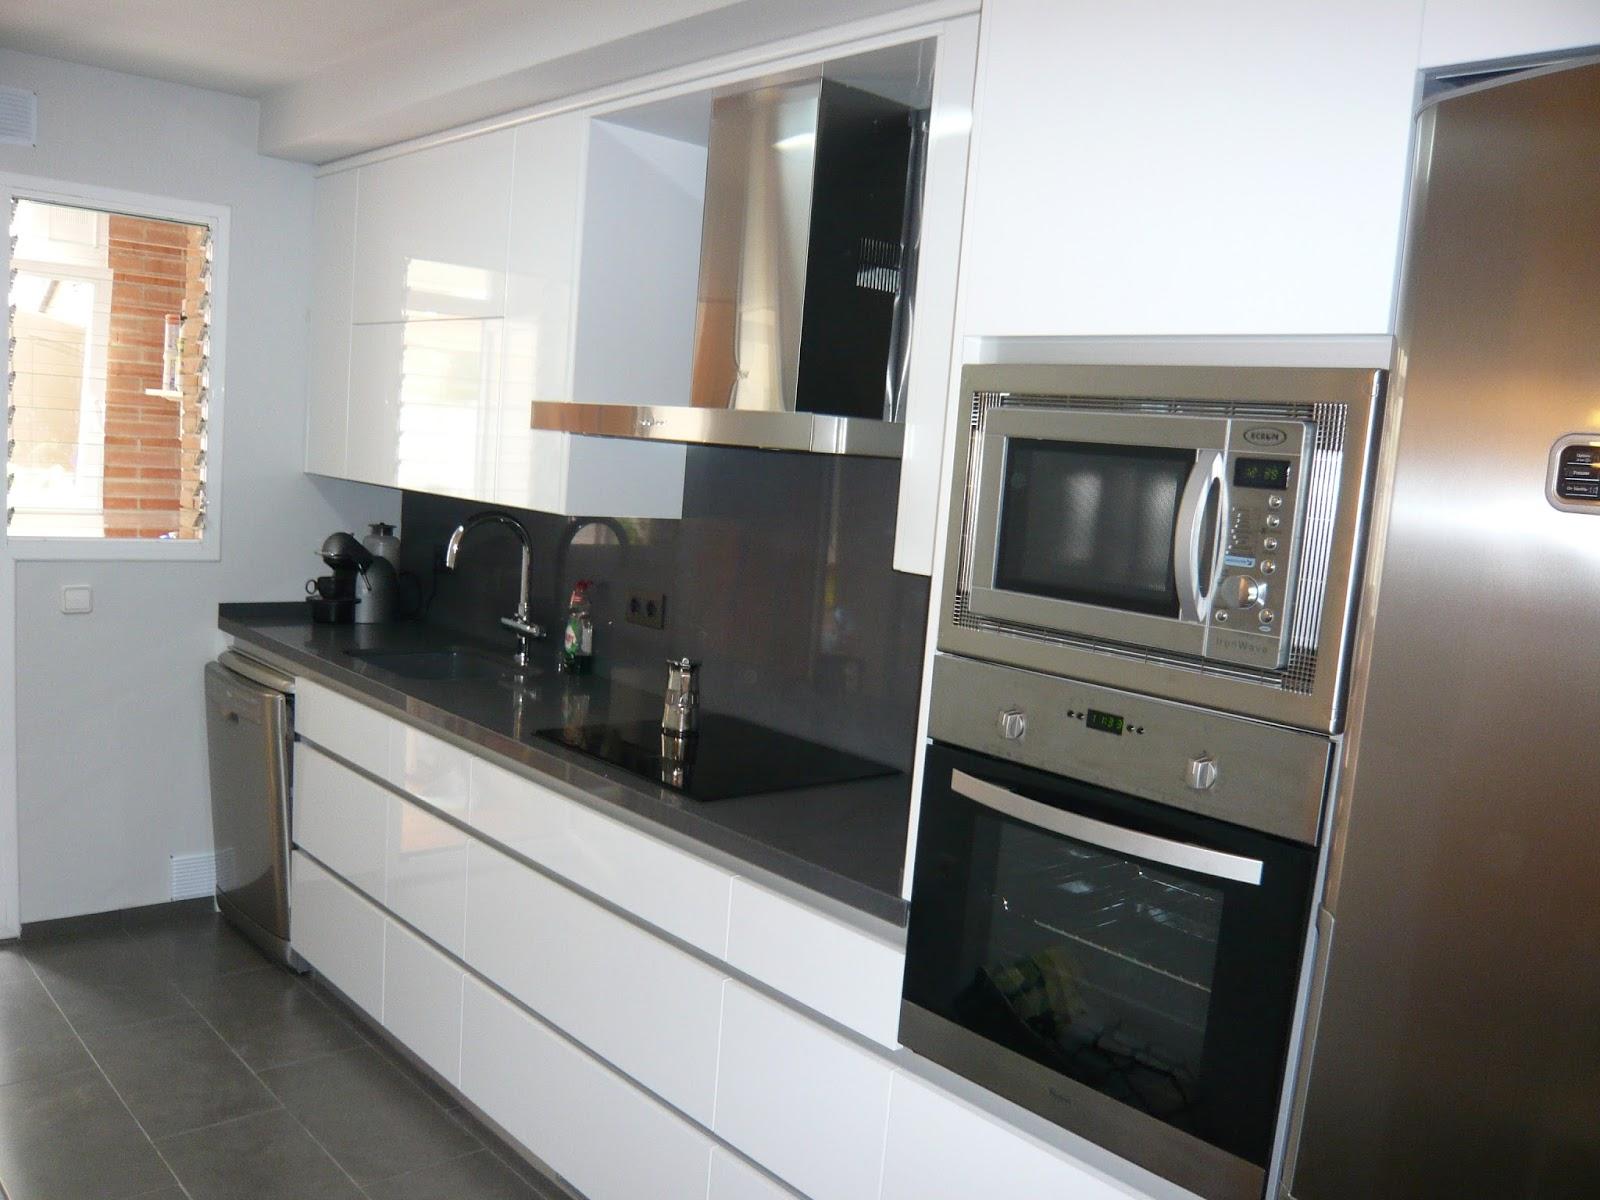 Reuscuina muebles de cocina sin tiradores - Tiradores y pomos para muebles ...